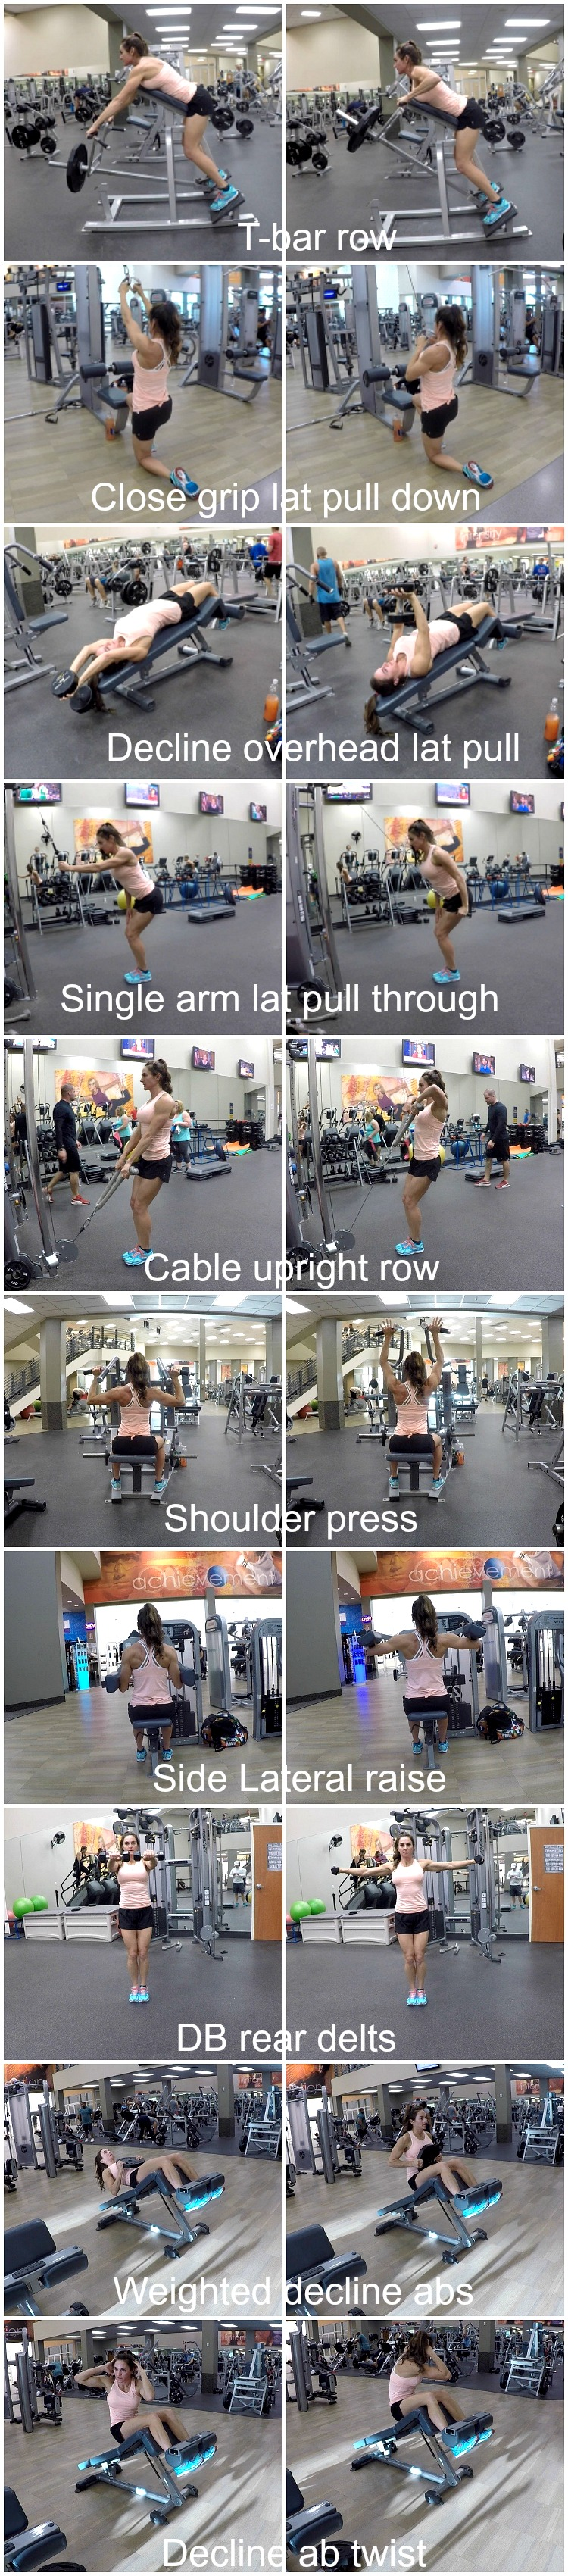 2 Week Workout Plan Day 10: Back Shoulders Abs | Fitness Food Diva